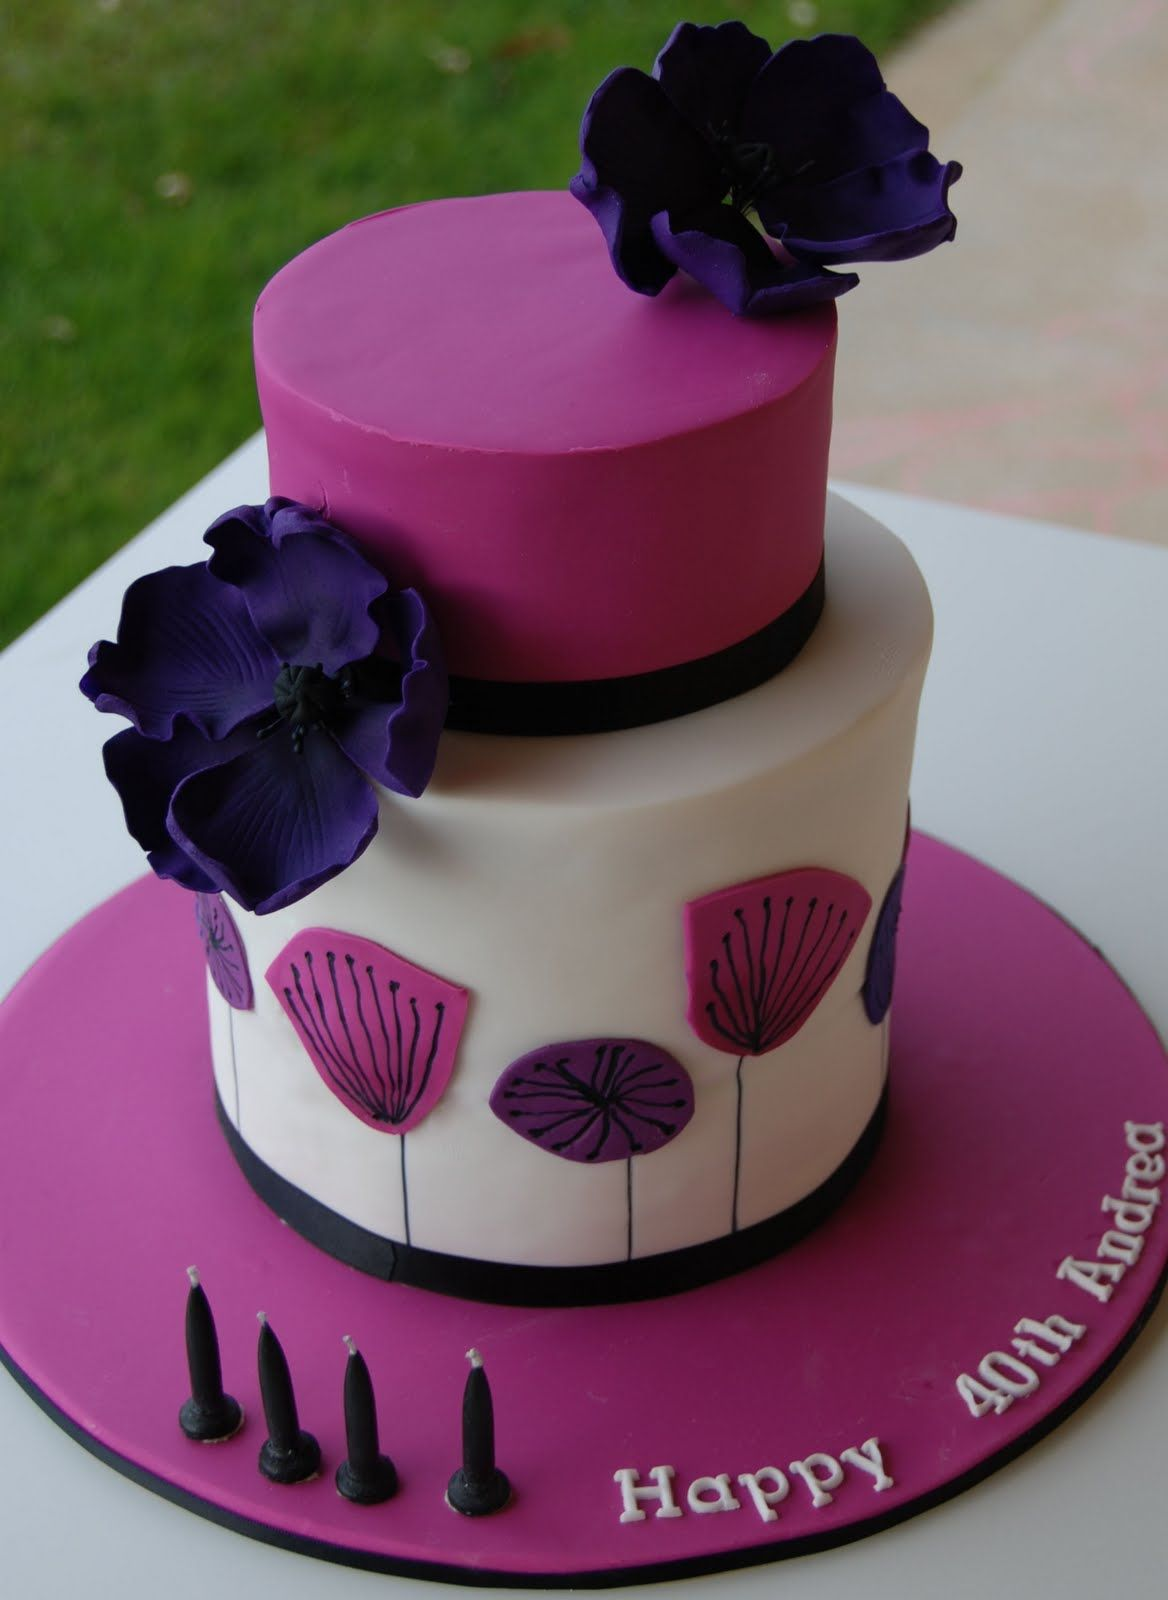 40th birthday cake Google Search Birthday cake for